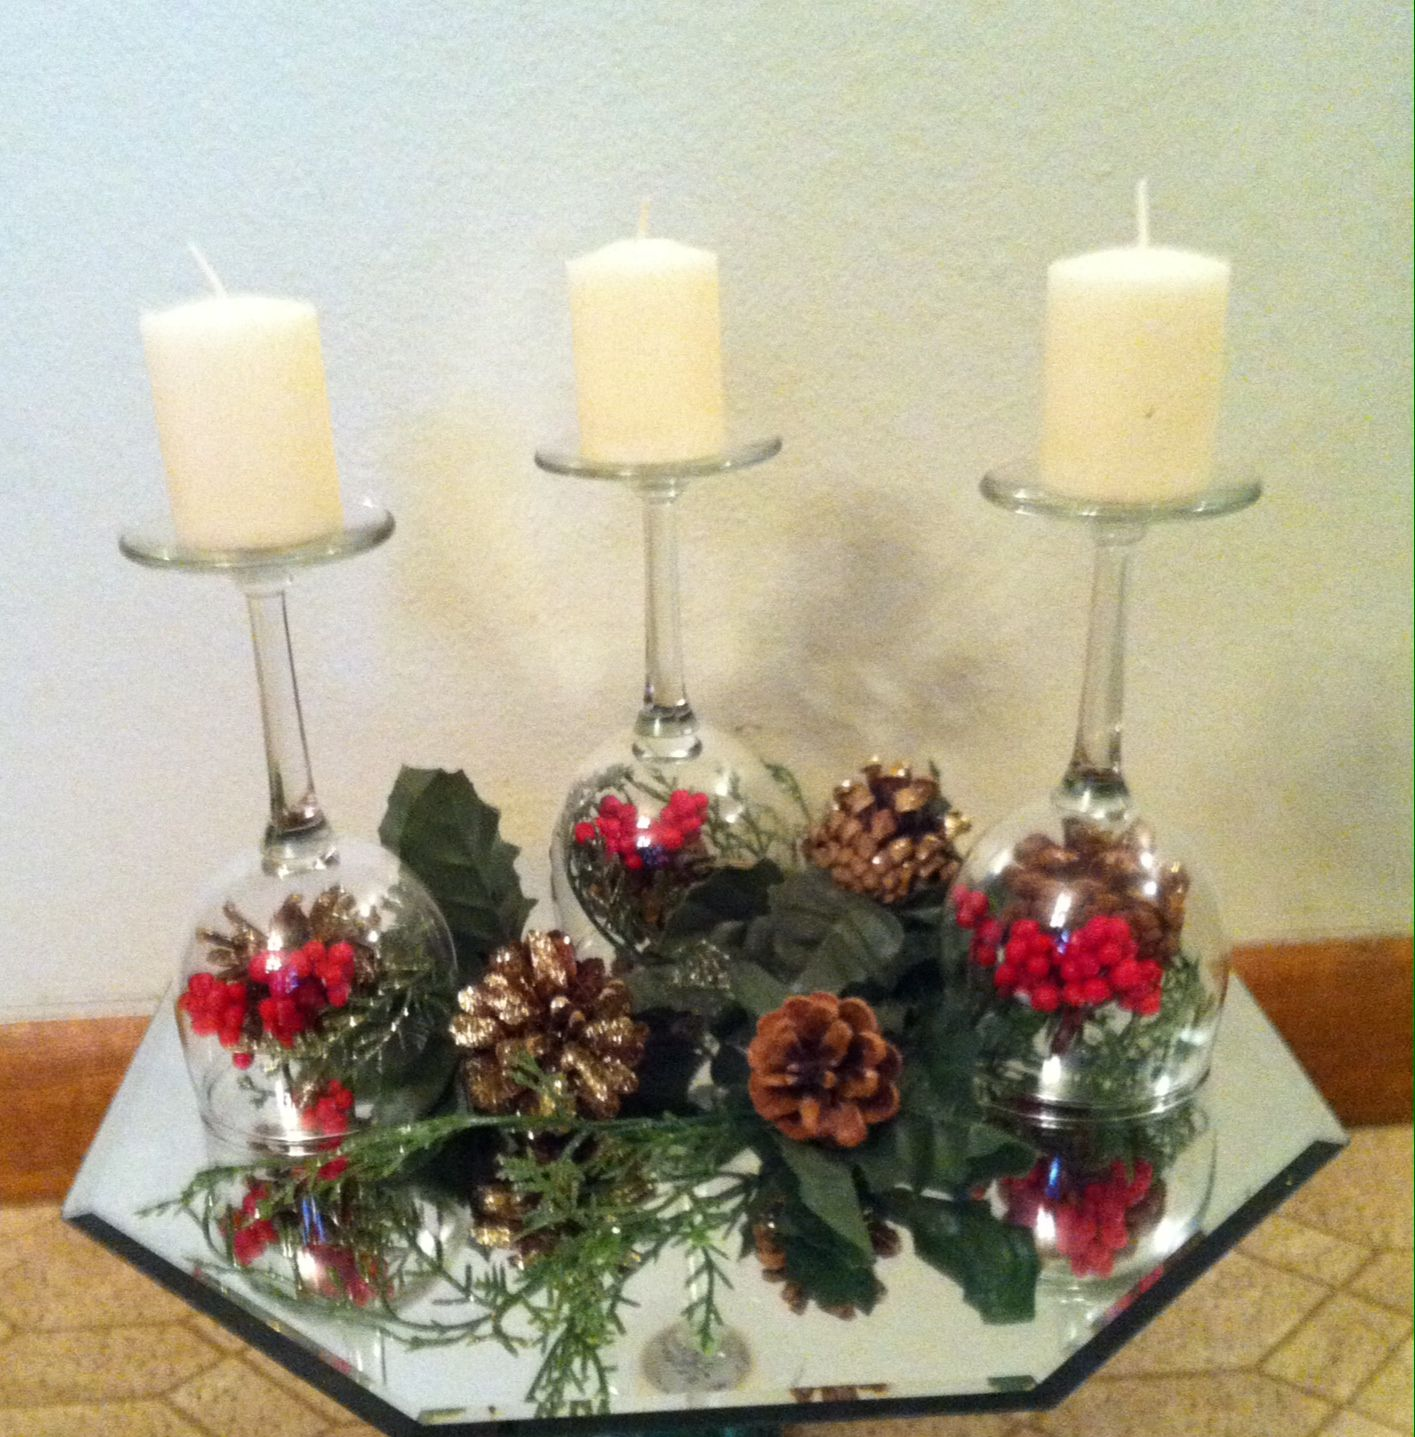 Wine Glass Centerpiece Christmas Table Centerpieces Wine Glass Centerpieces Christmas Decorations